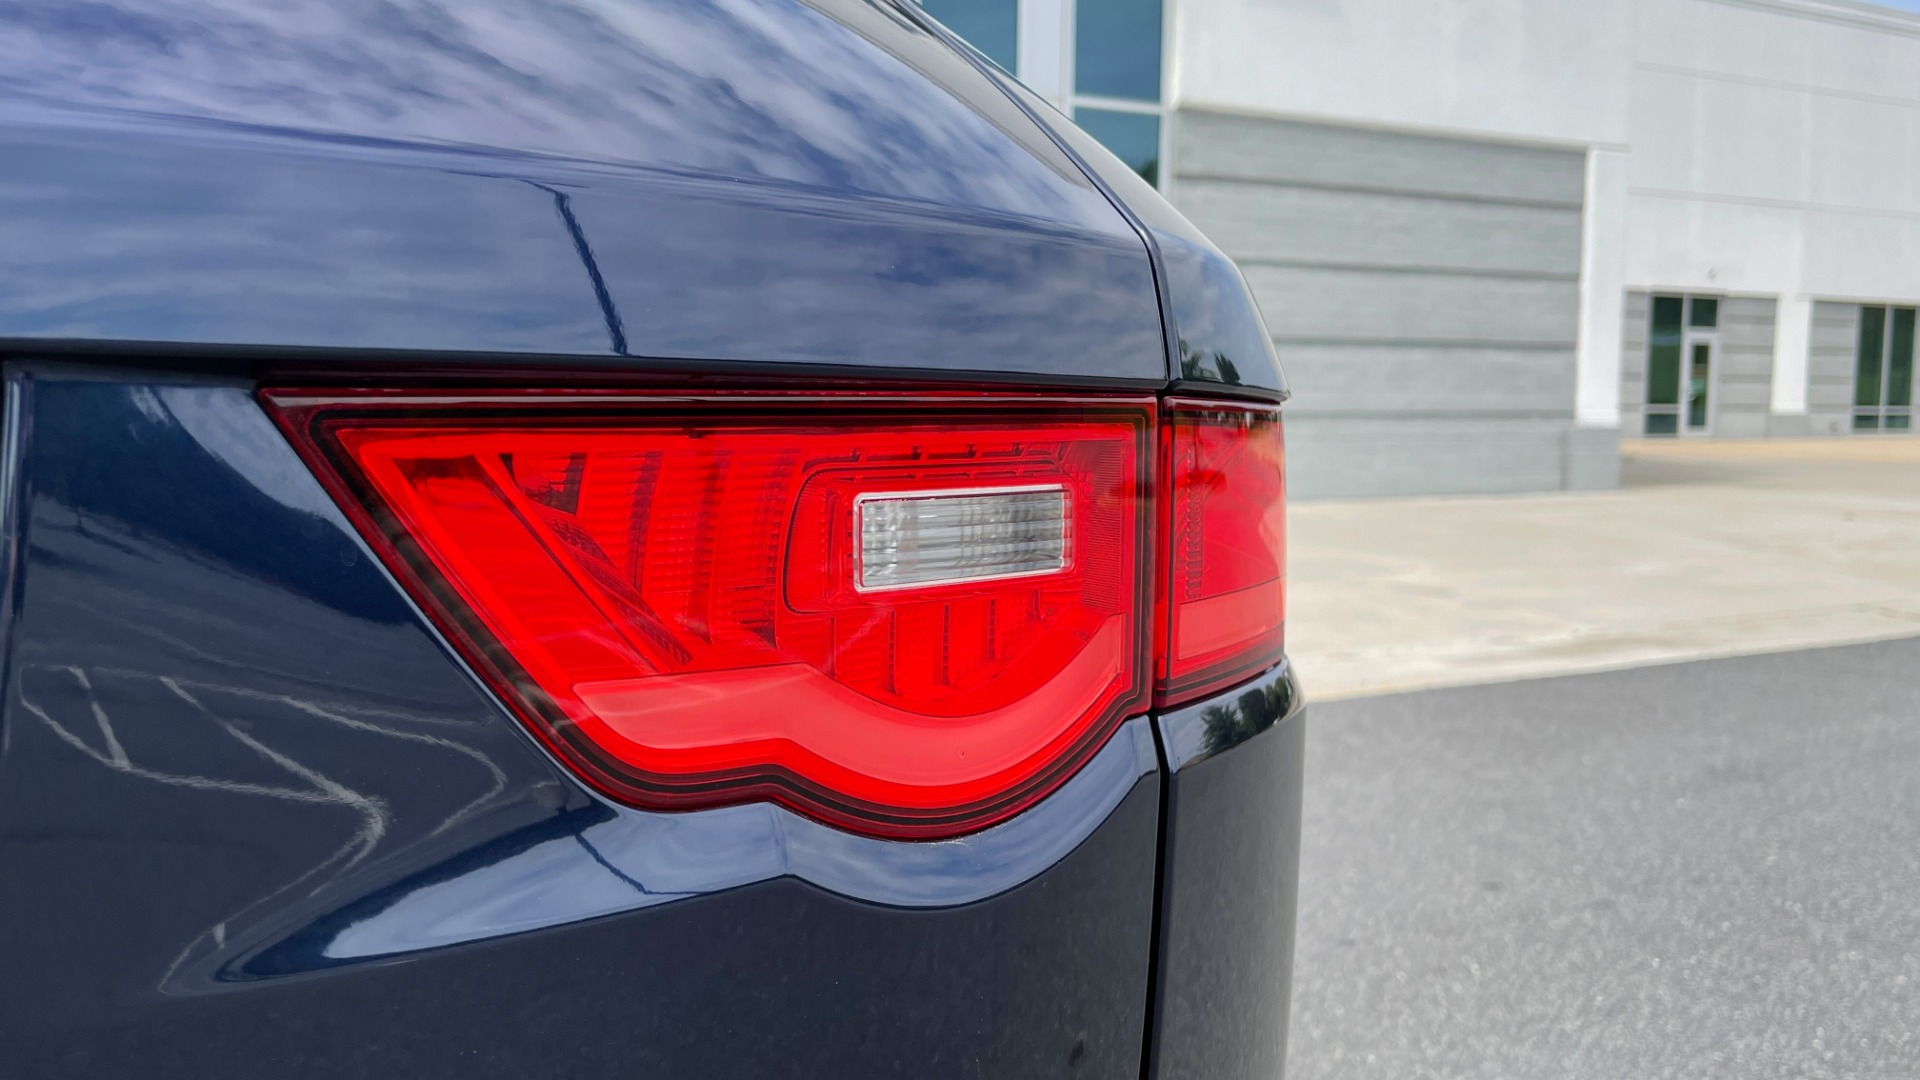 Used 2019 Jaguar F-PACE S / DRIVE PKG / BSA / HUD / BLACK EXT PKG / REARVIEW for sale $50,995 at Formula Imports in Charlotte NC 28227 24